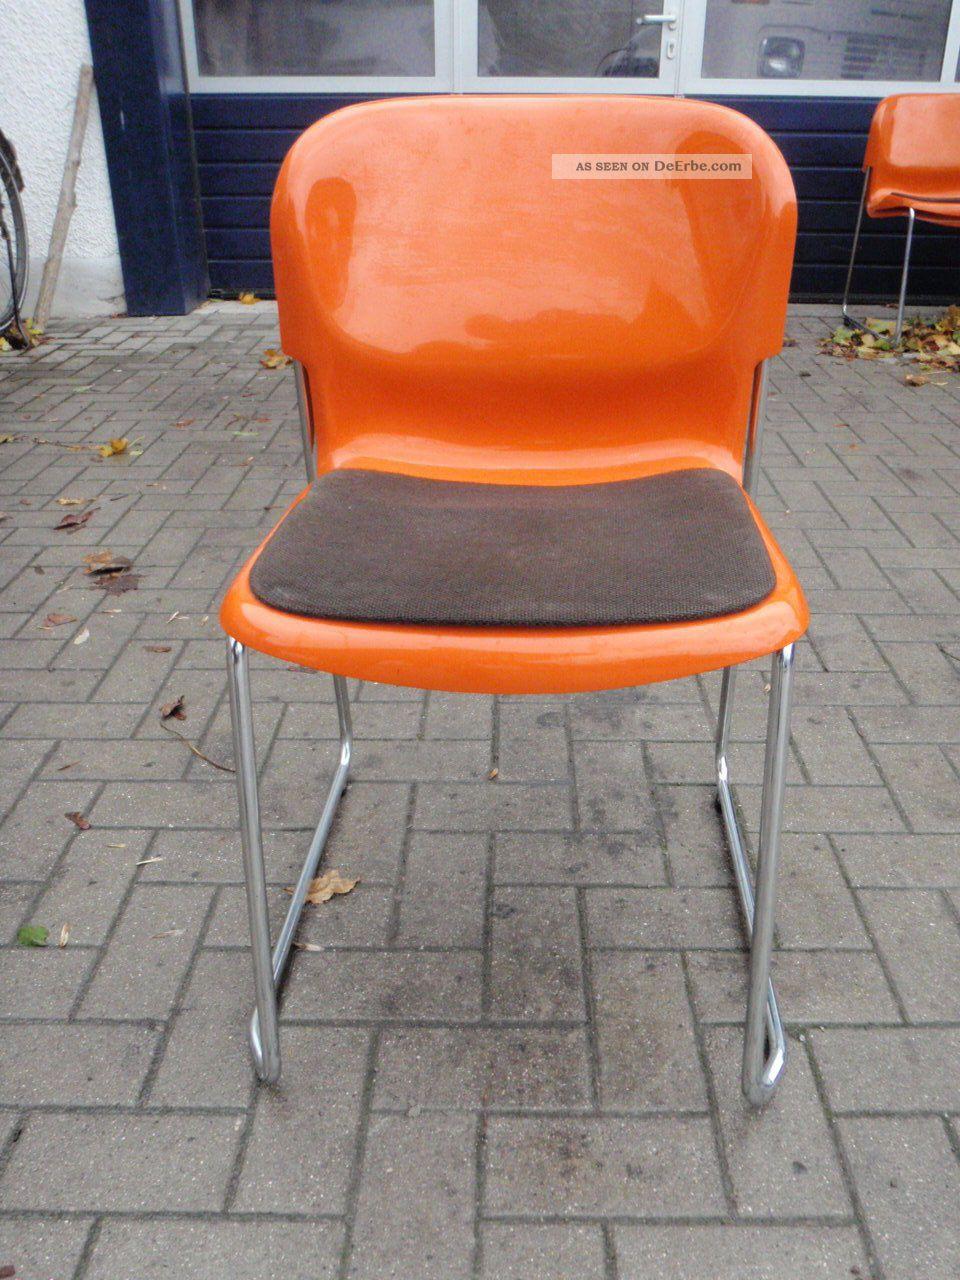 stuhl gerd lange design 70er orange st hle stapelbar swing drabert sm 400 2st ck. Black Bedroom Furniture Sets. Home Design Ideas